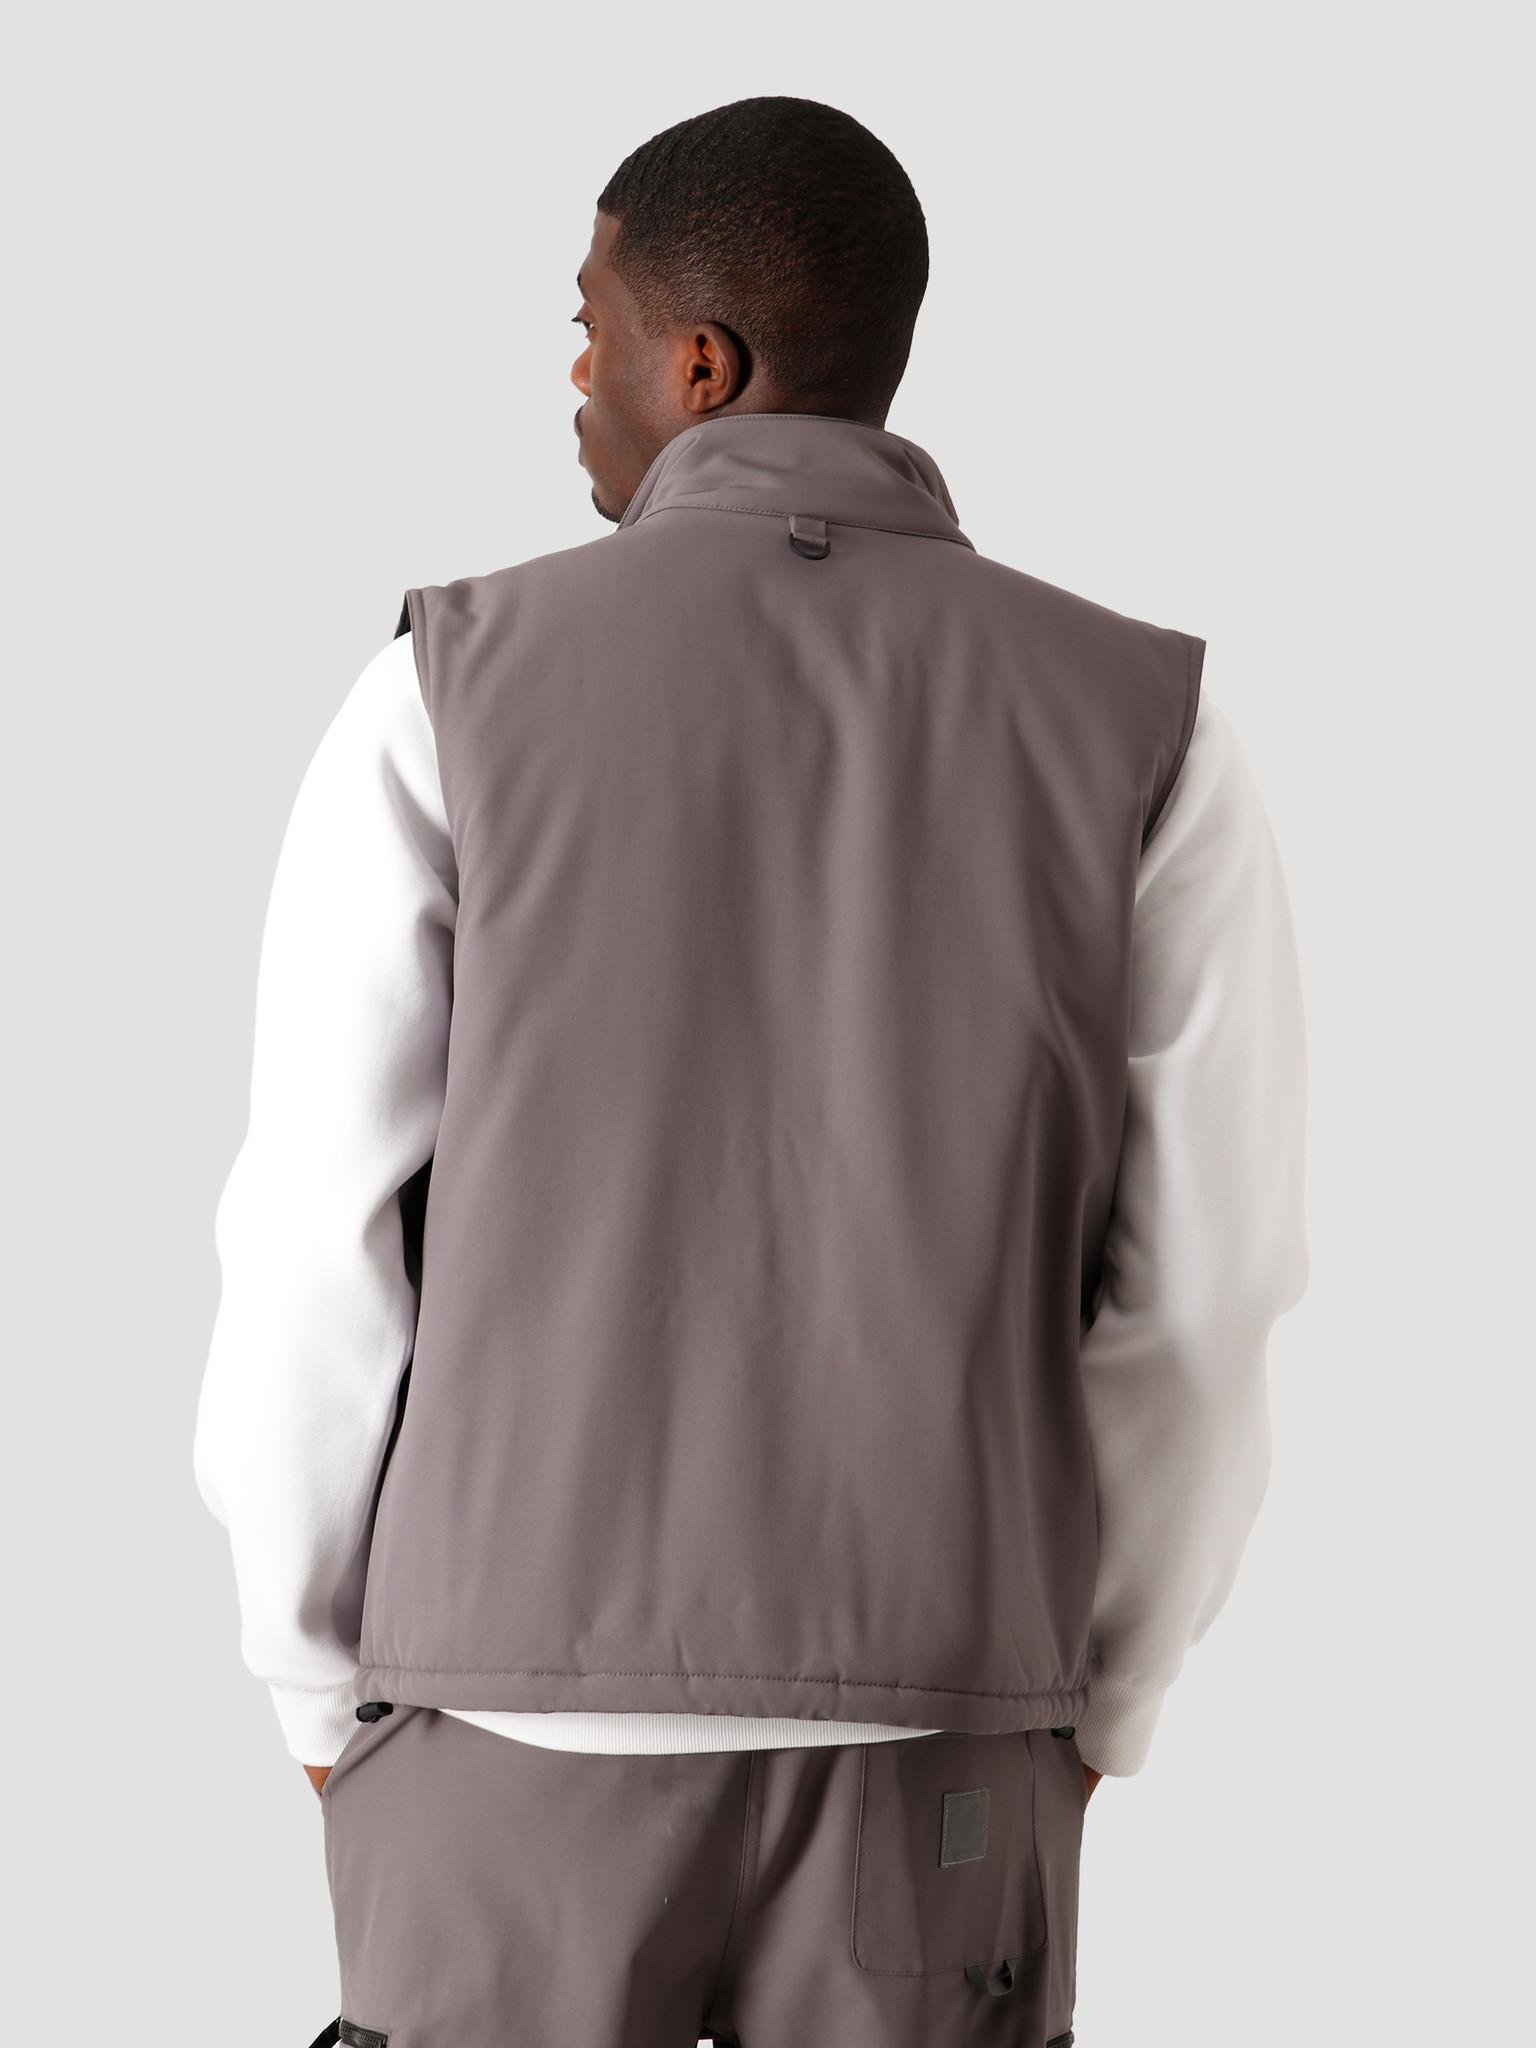 Carhartt WIP Carhartt WIP Colewood Vest Husky I028382-0F700